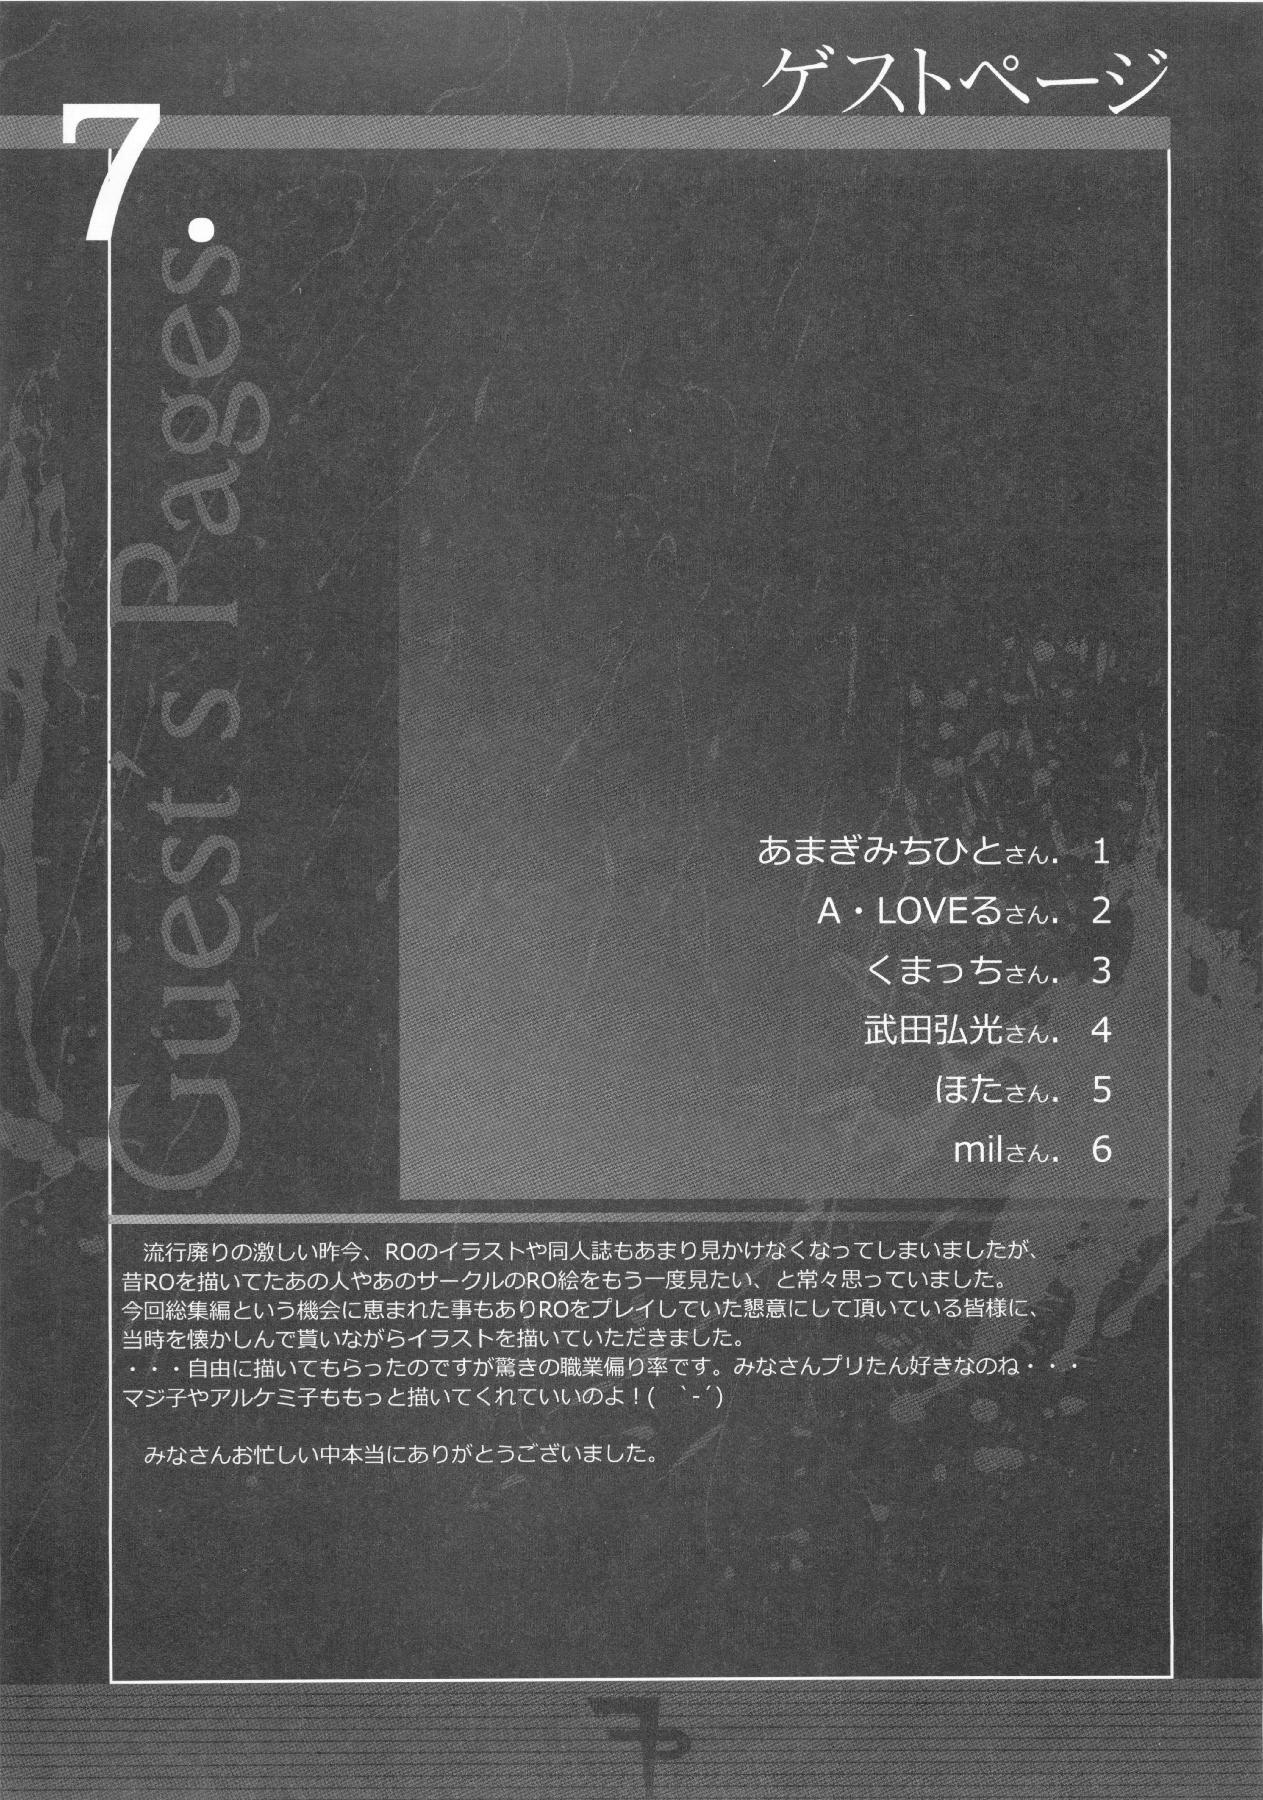 (C83) [Fatalpulse (Asanagi)] VictimGirls Compiled Vol.1 -Victimgirls Soushuuhen 1- MMO Game Selection (Various) 181